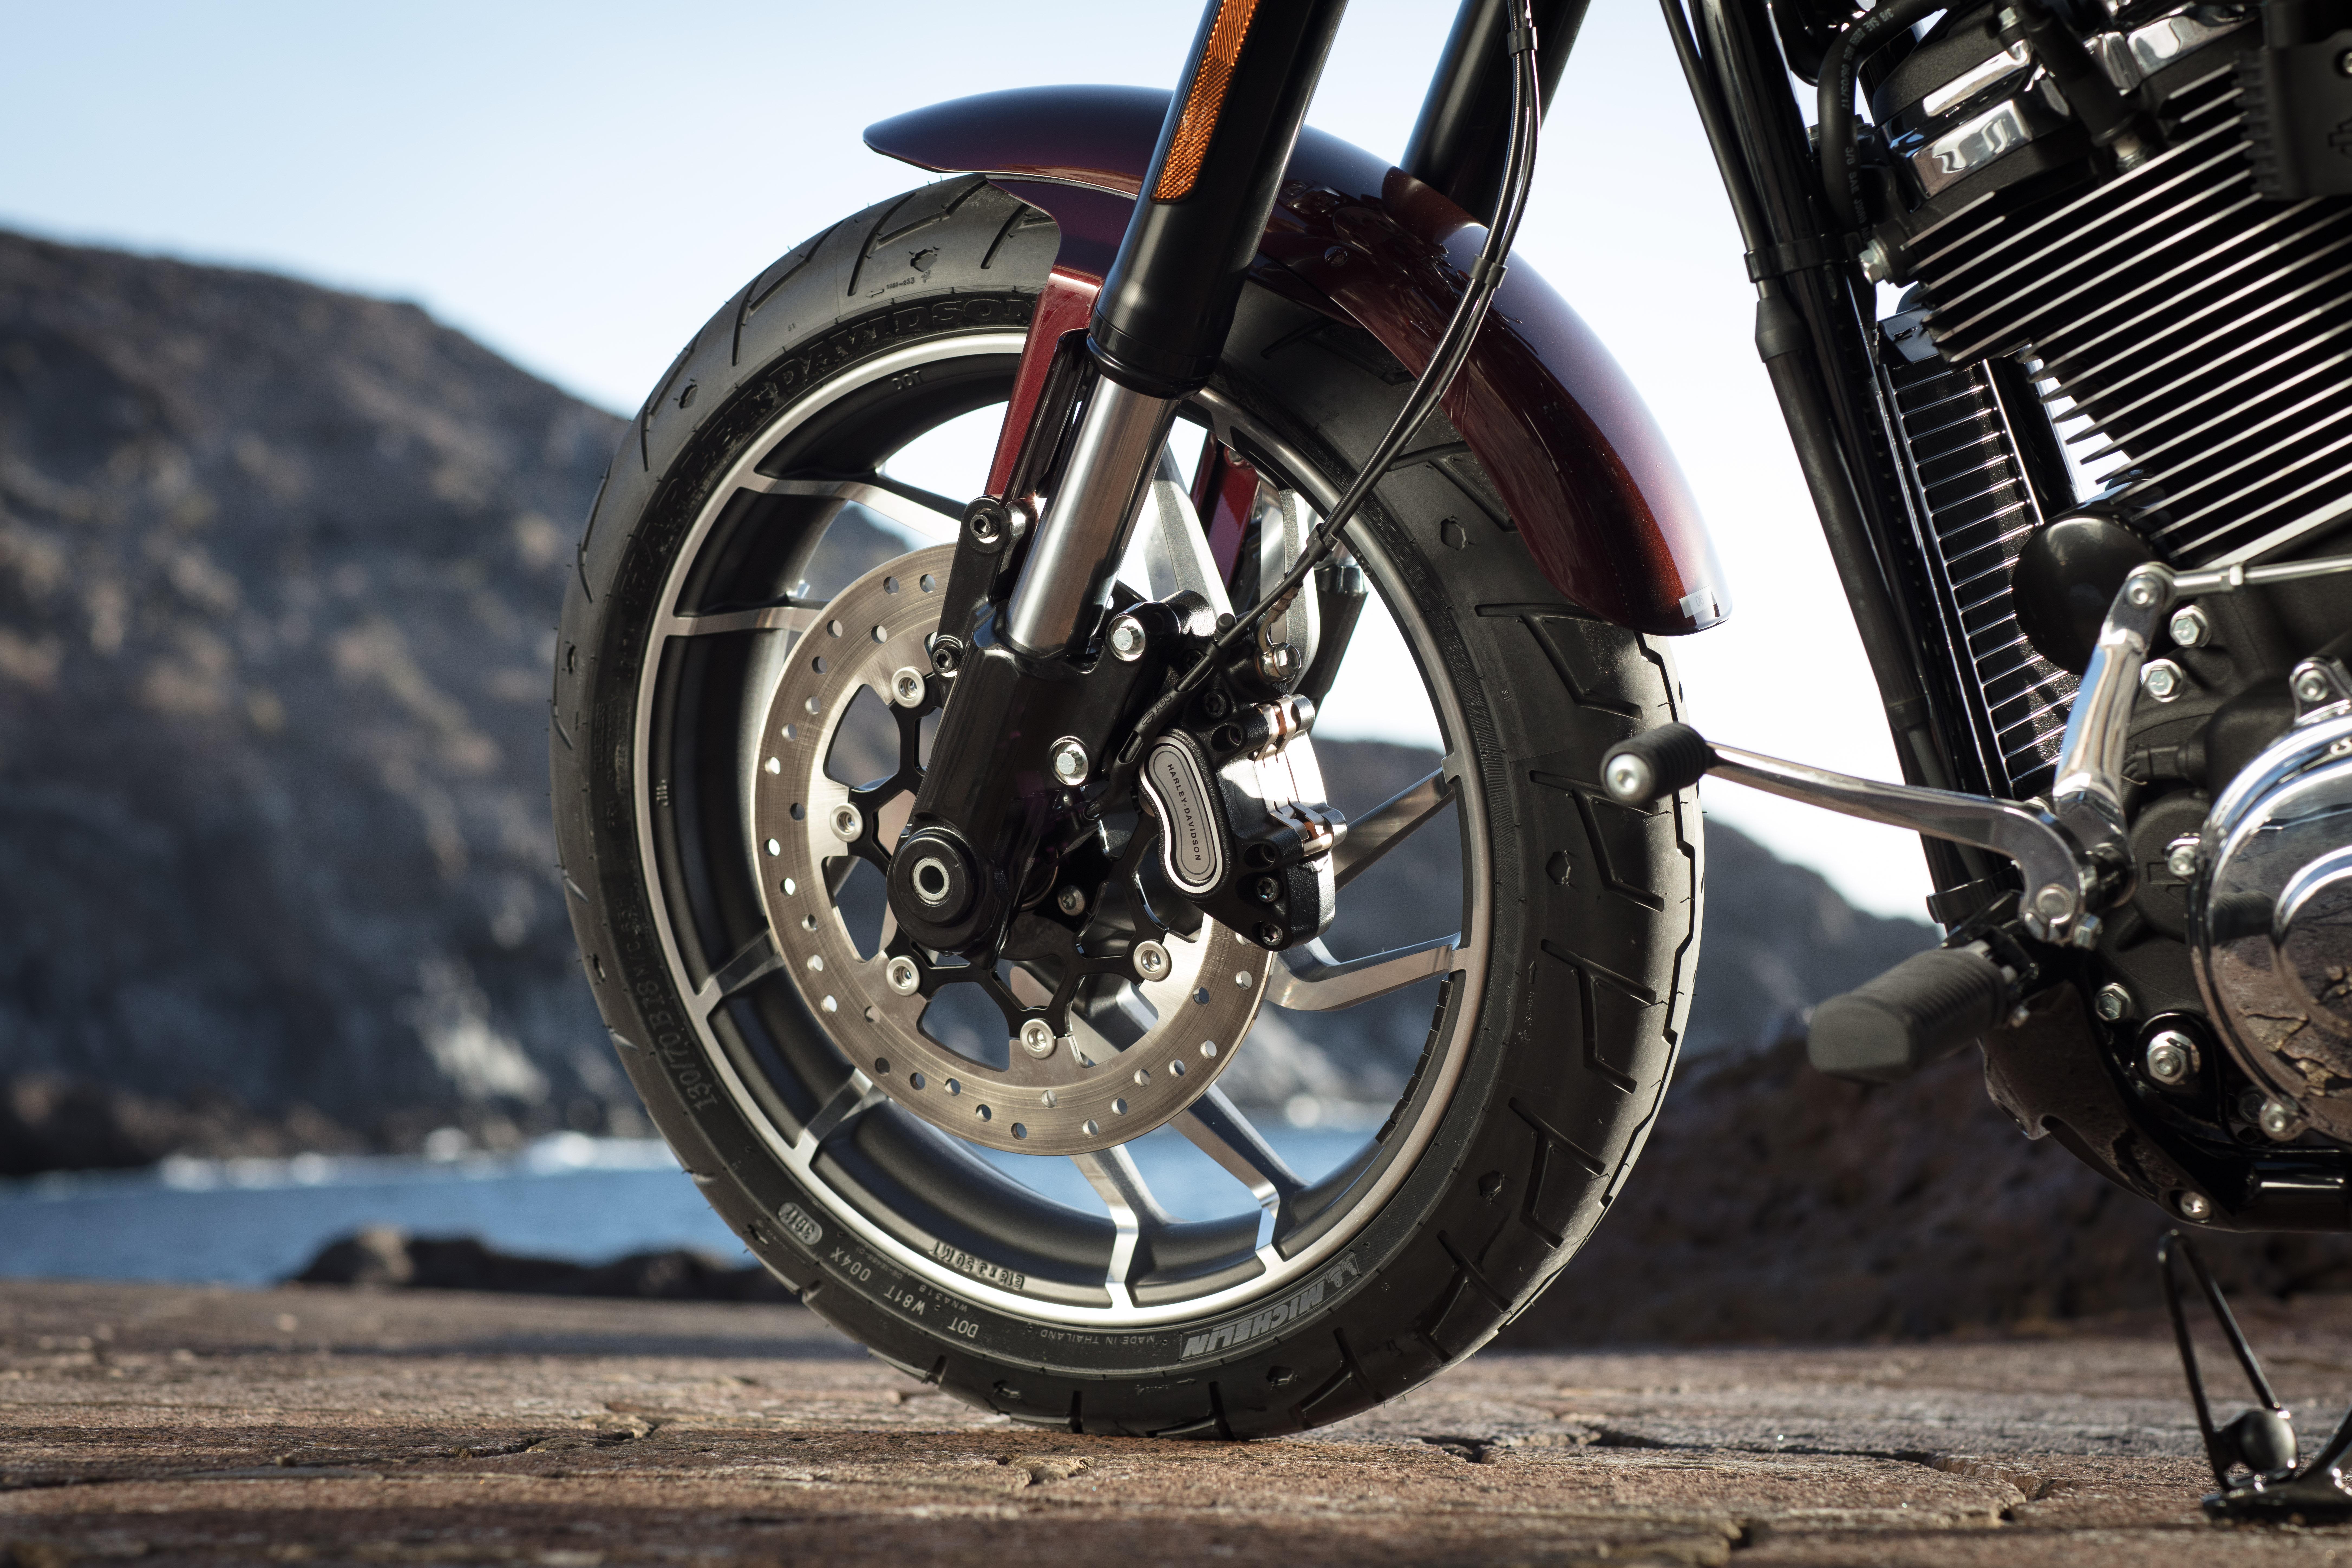 Sport Glide, ou la Harley modulable